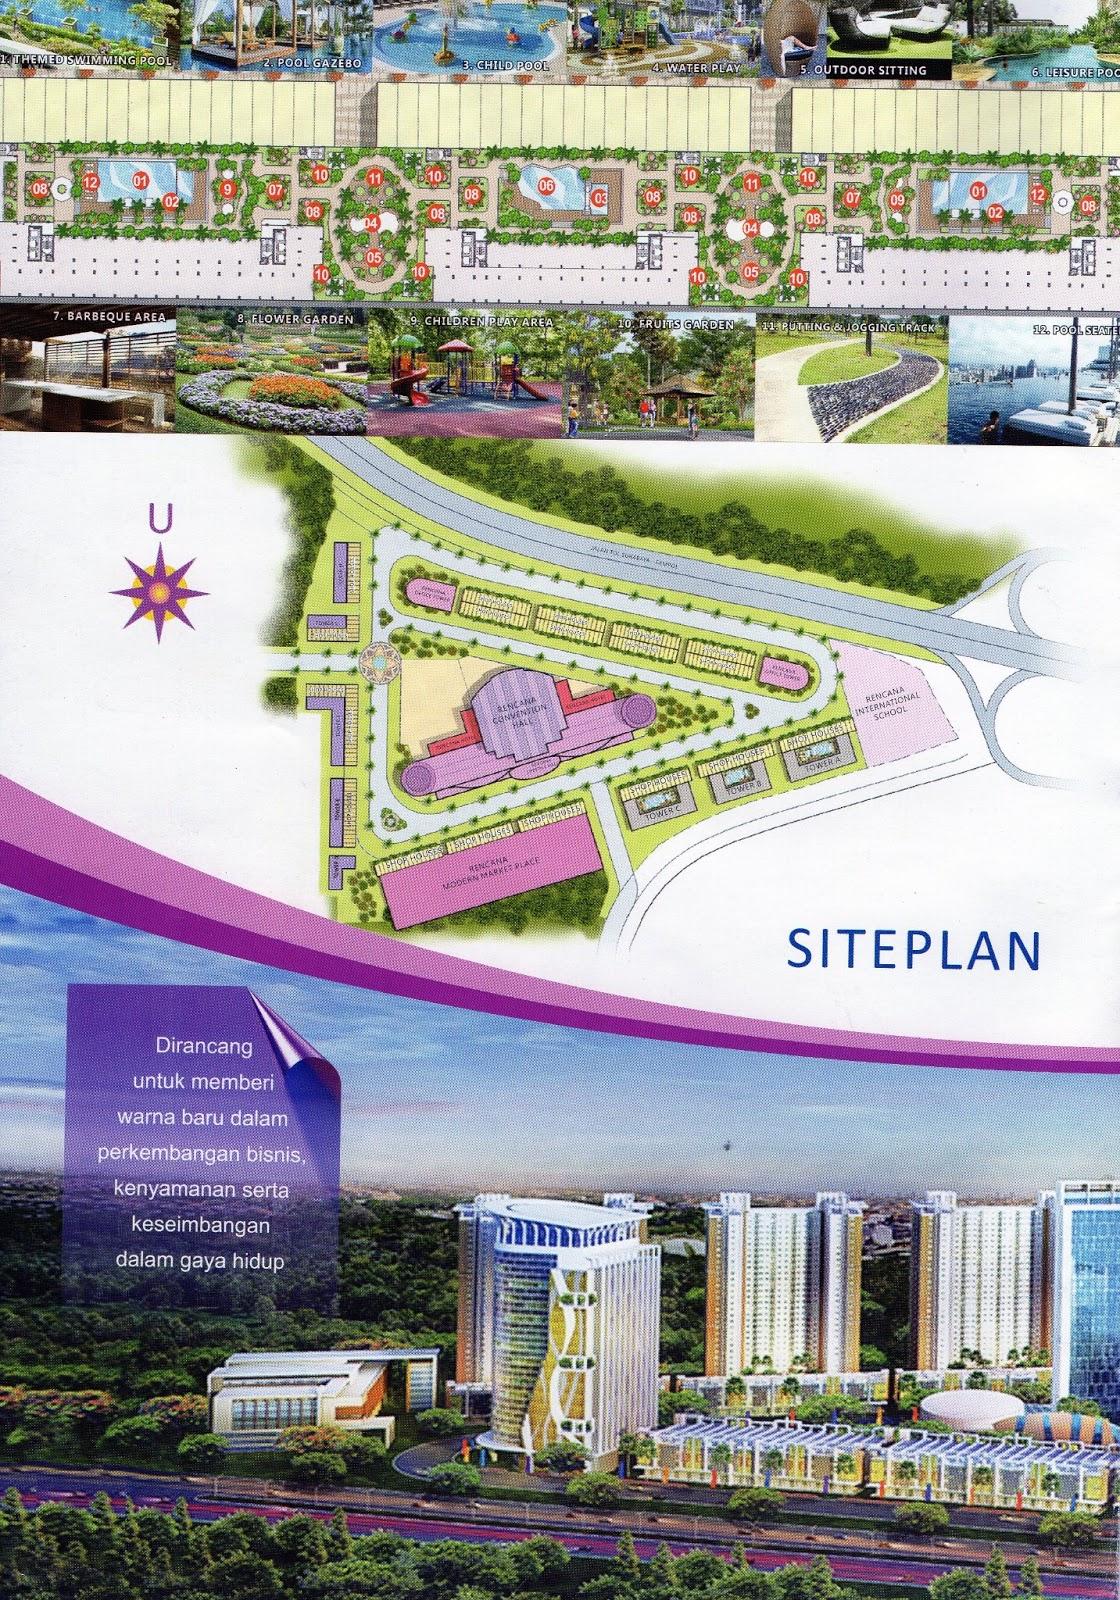 Your 1st Choice In Property Ruko Surabaya Barat Dekat Perumahan Elit Dan Daerah Ramai Ptc Dan